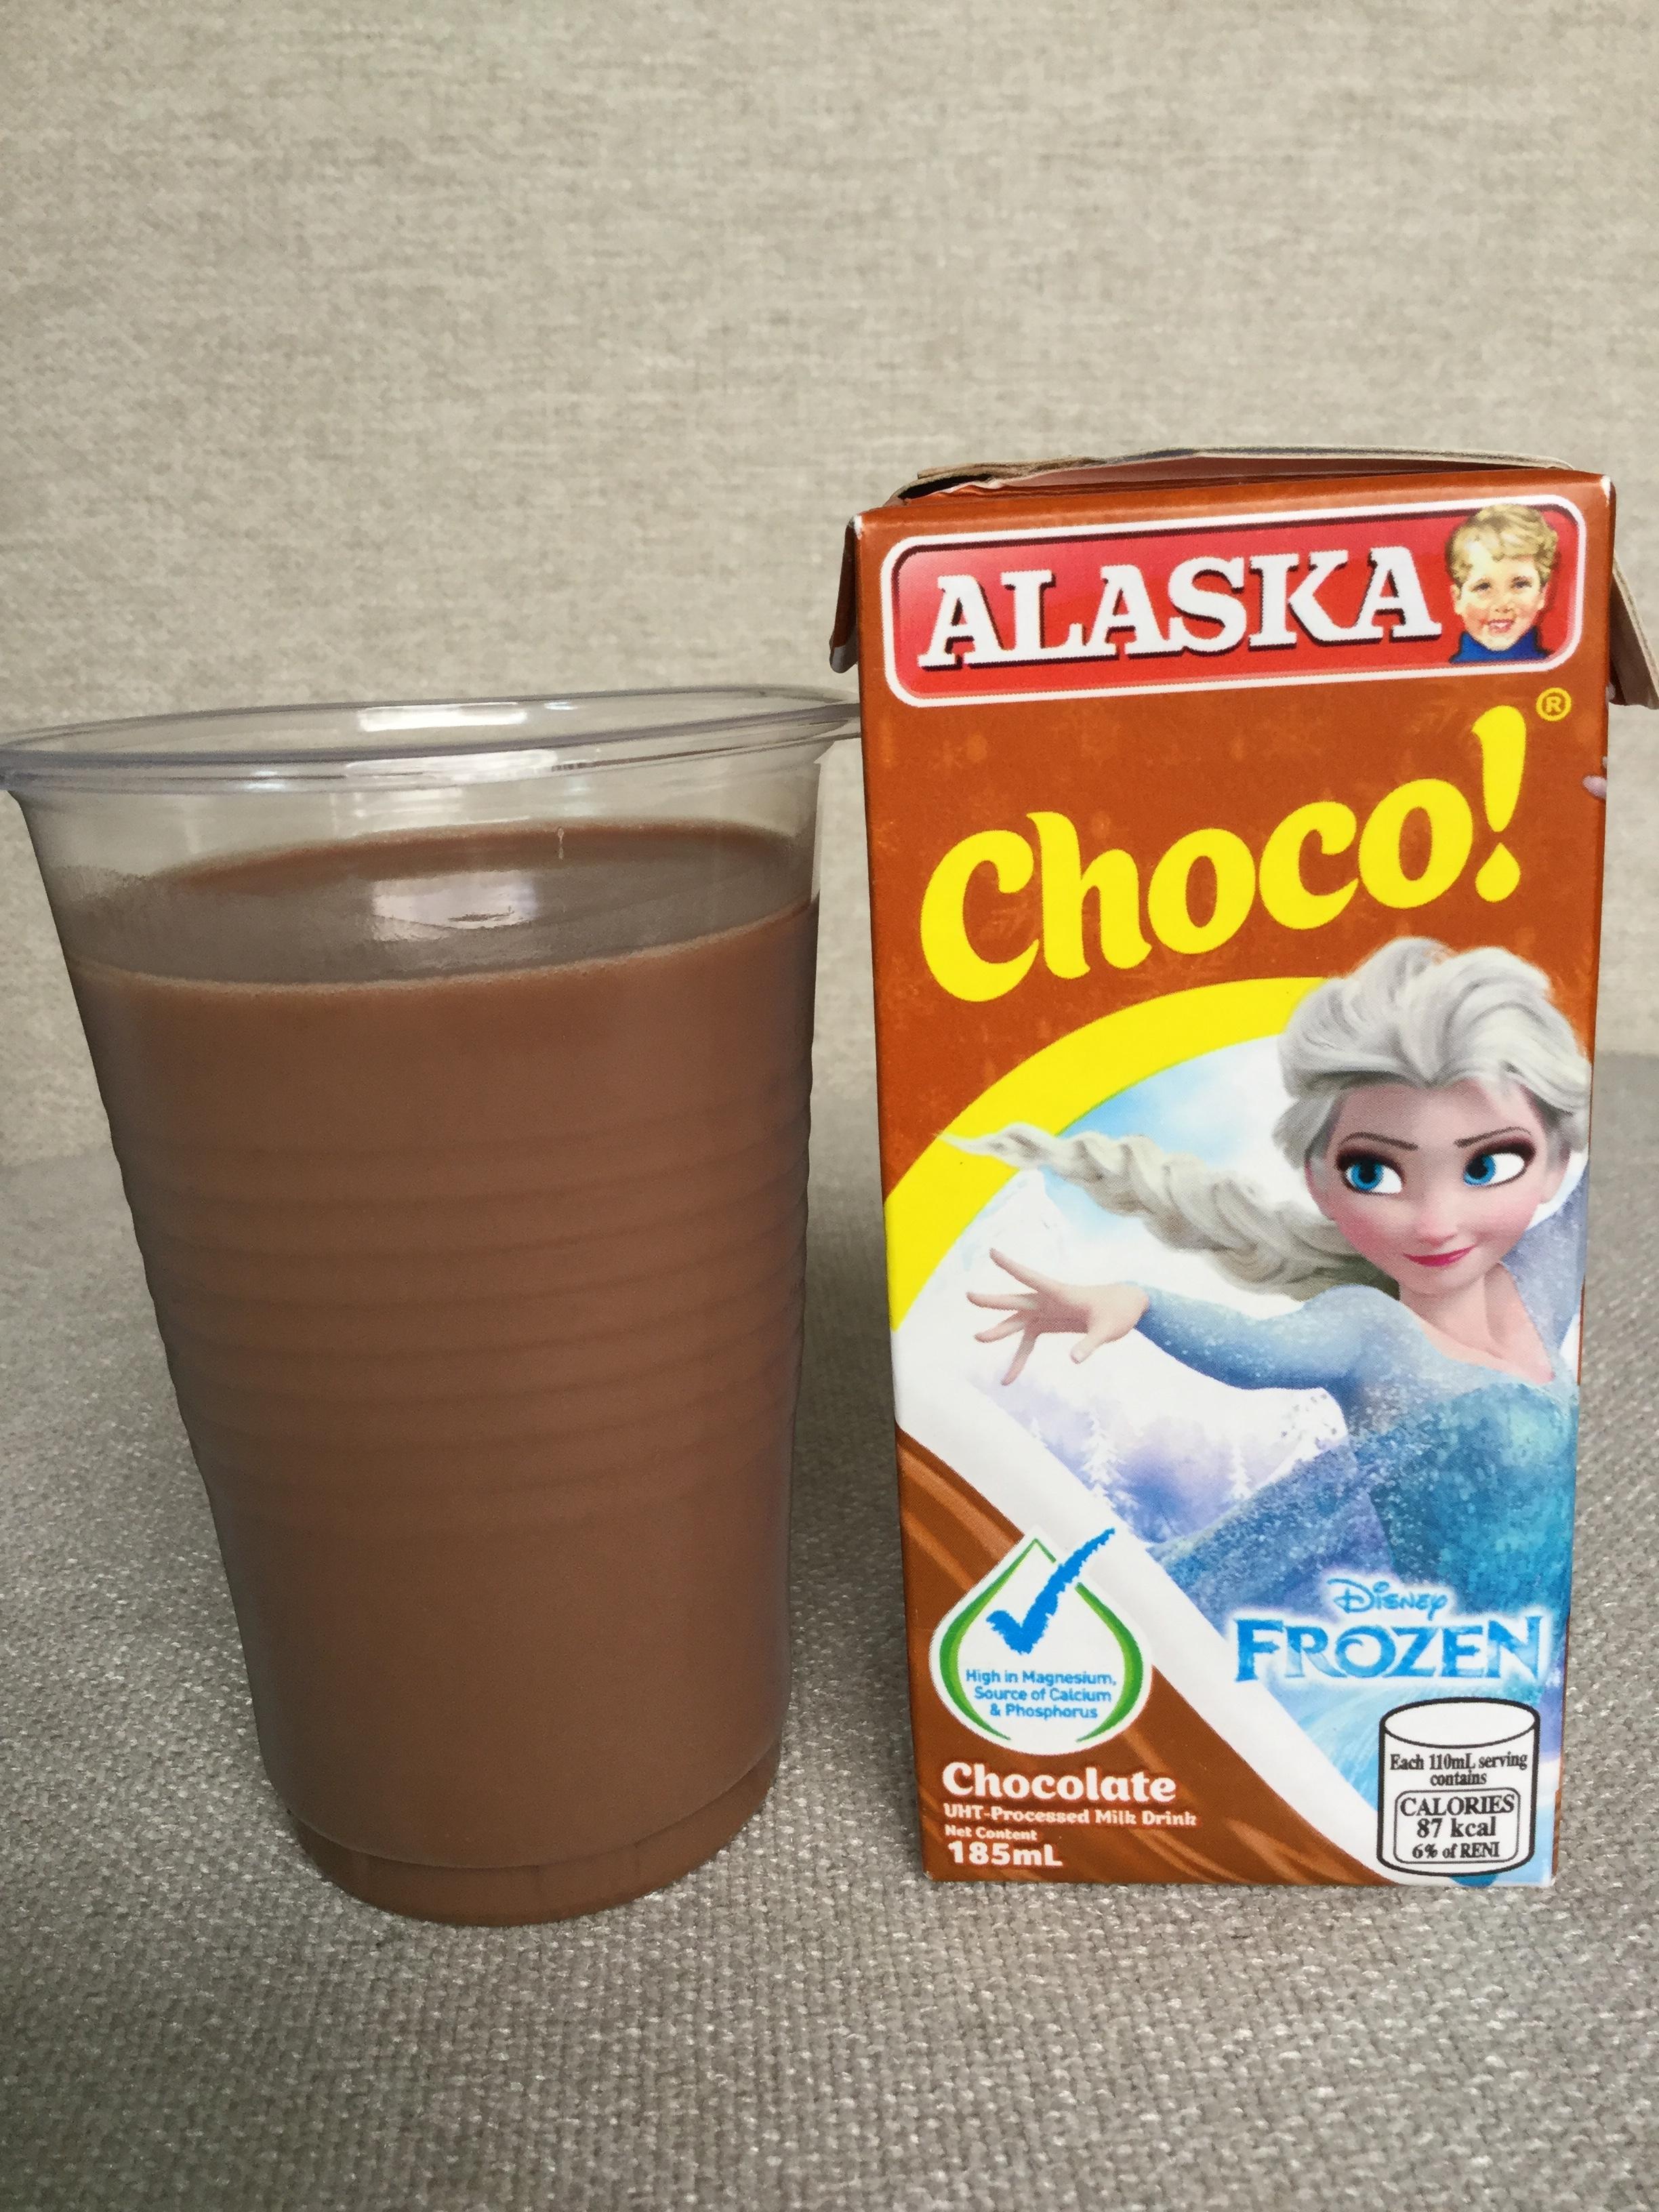 Alaska Choco! Cup